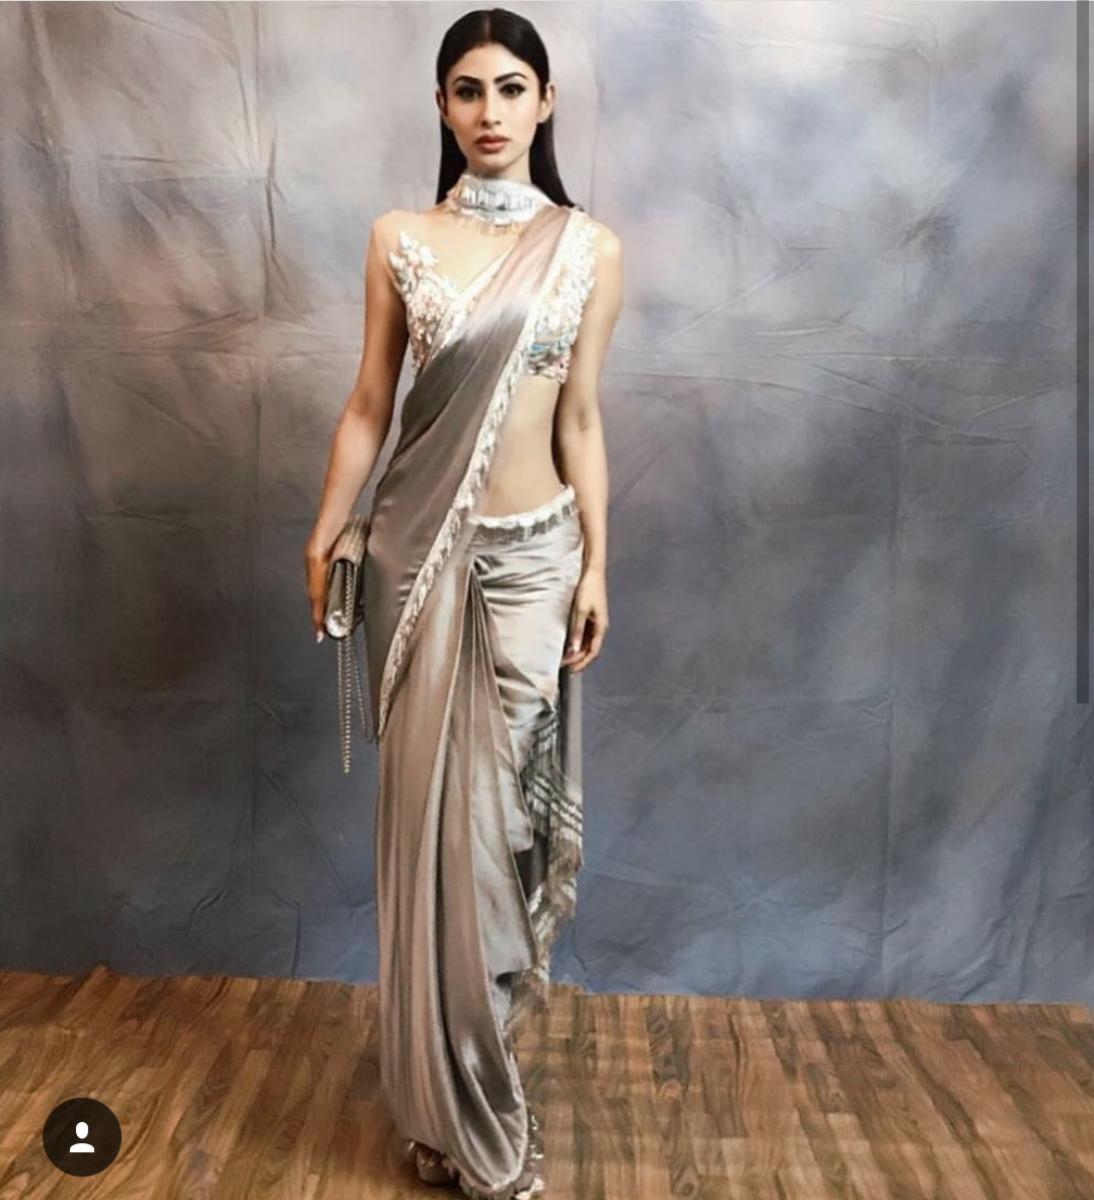 Actresses like Mouni Roy, Tanishaa Mukerji and Kareena Kapoor Khan were trolled online for being too thin.